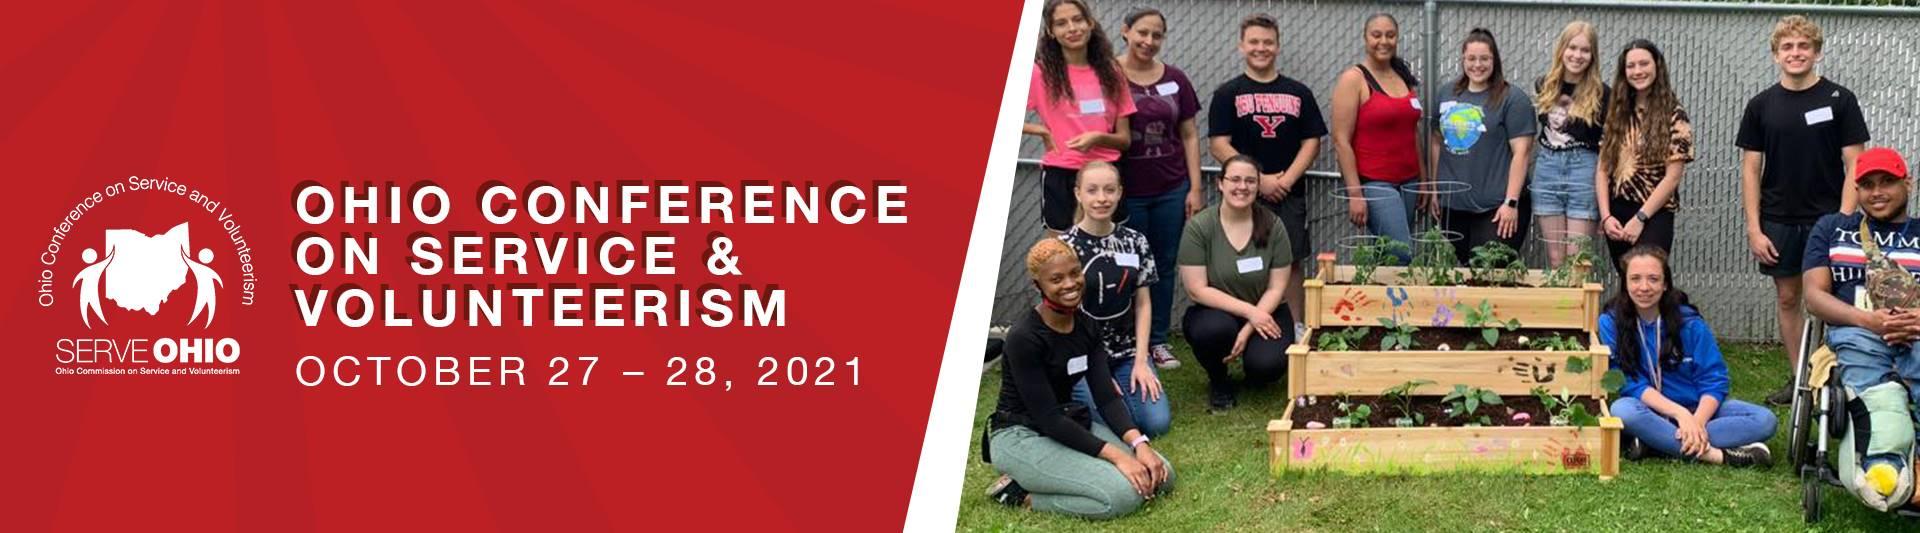 2021 Virtual Ohio Conference on Service & Volunteerism